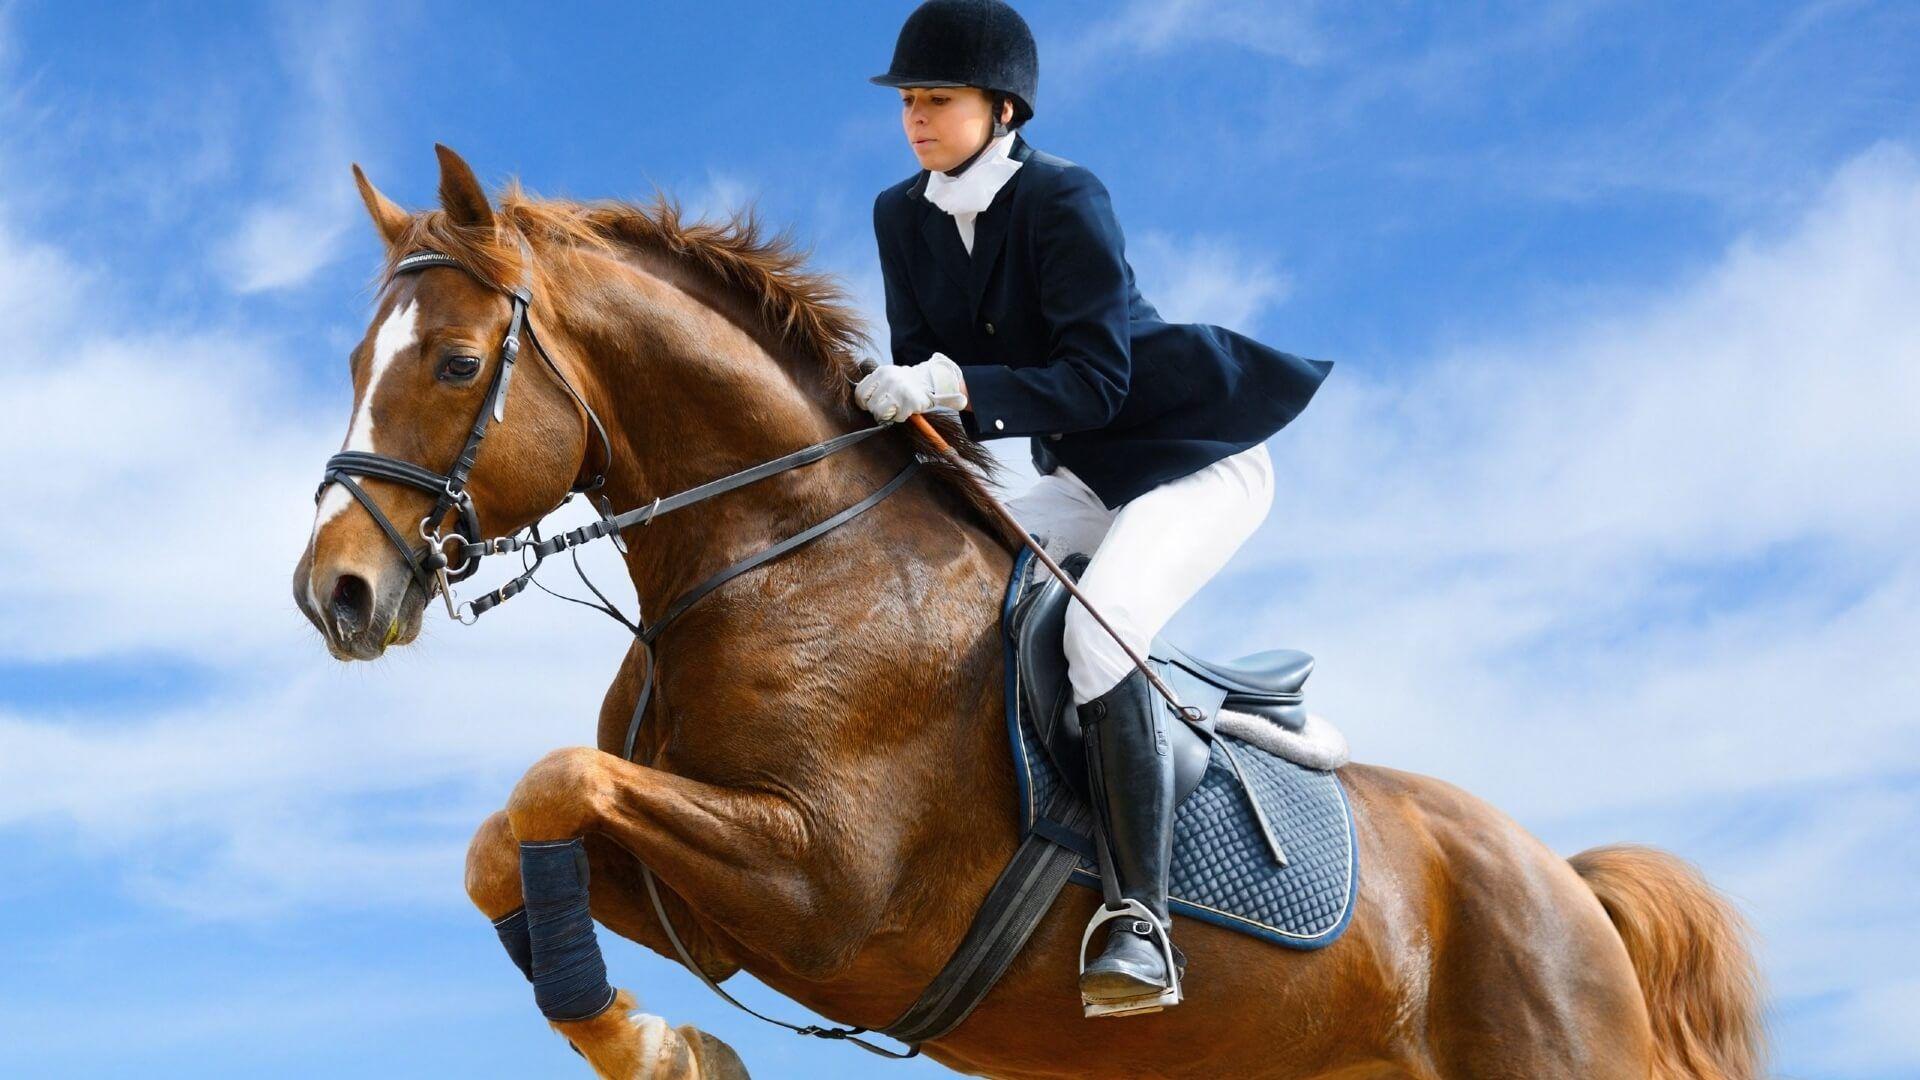 Equestrian beautiful wallpaper